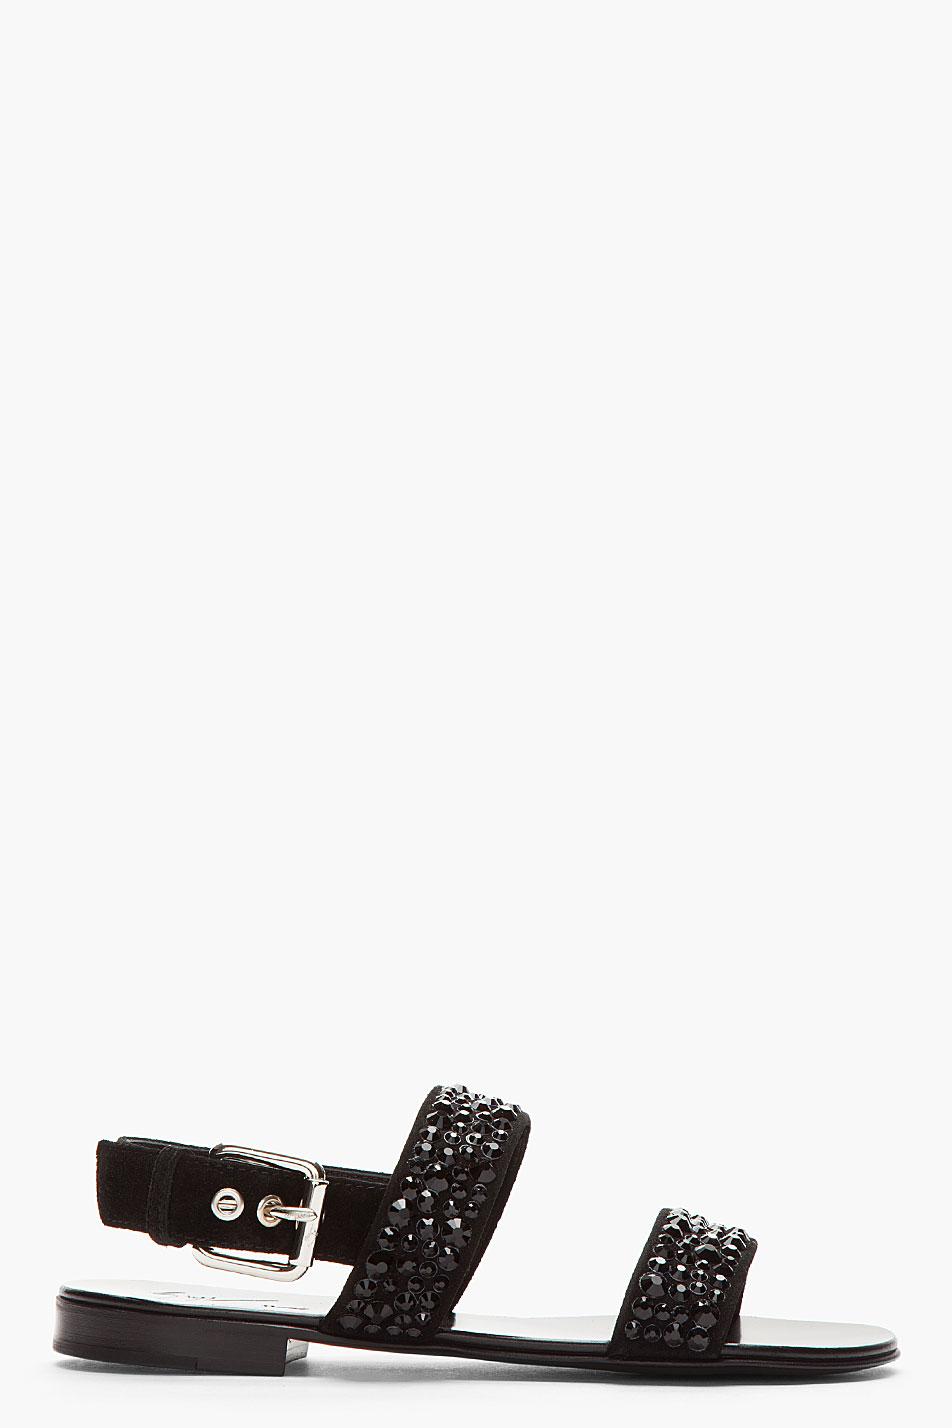 8d73756394efc6 Lyst - Giuseppe Zanotti Black Suede Crystal Studded Zak 10 Sandals ...